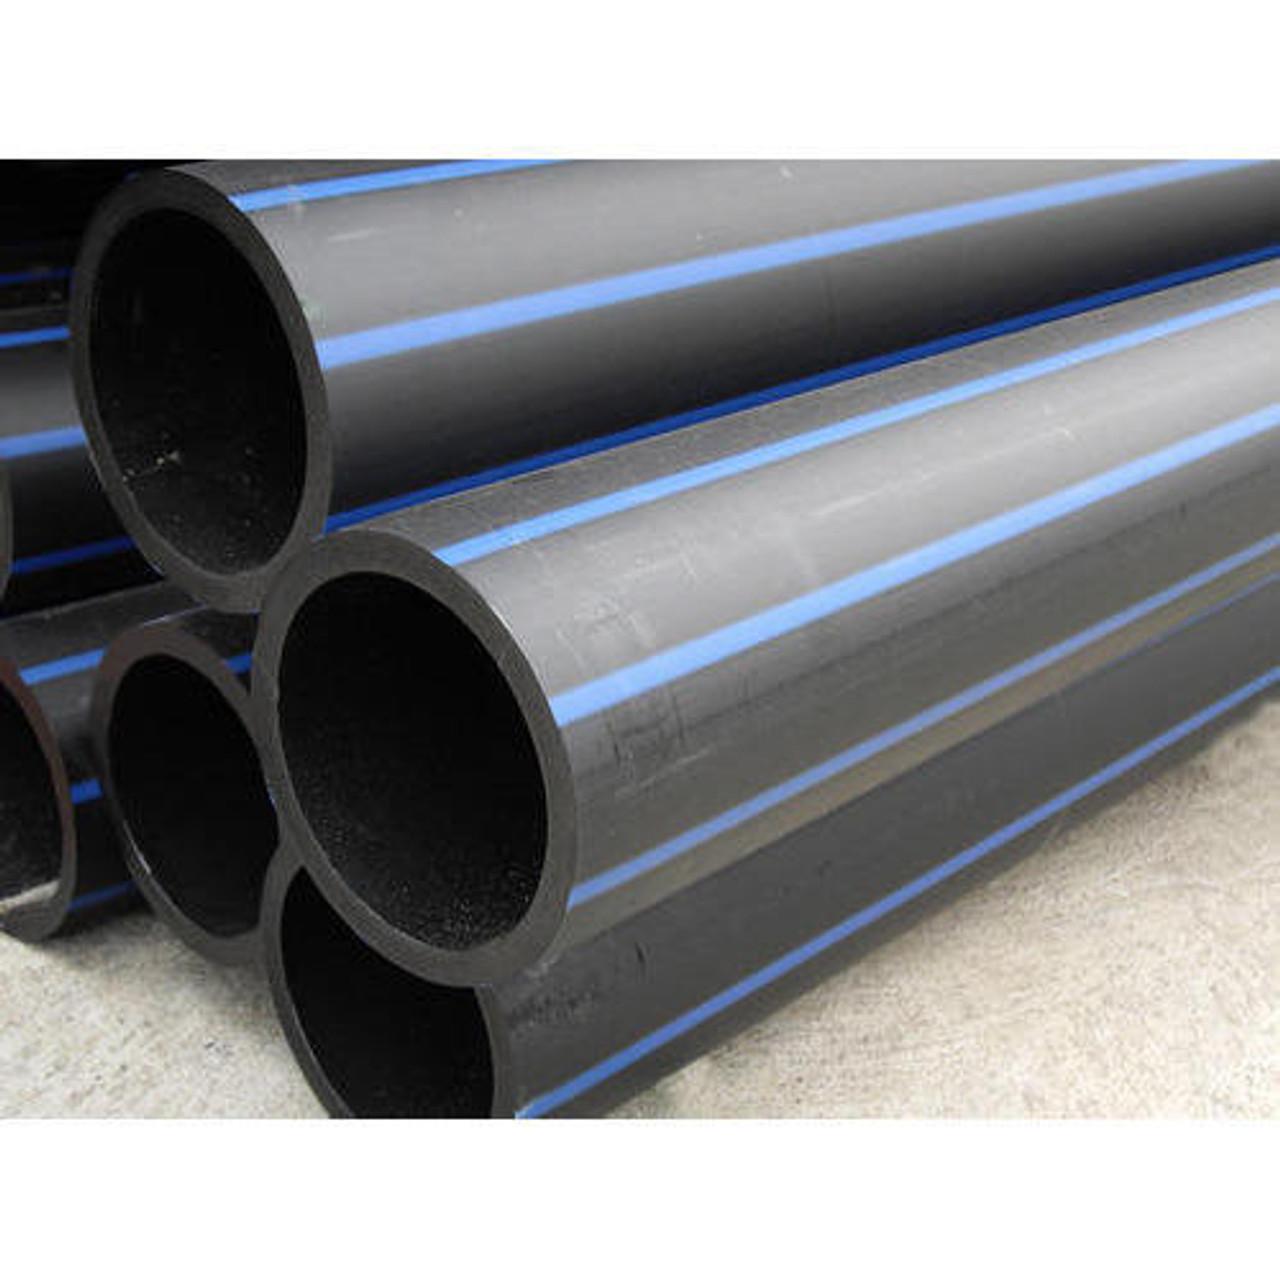 25mm PE100 PN16 Metric Polyethylene Pipe - Blue Stripe - 50m Coil